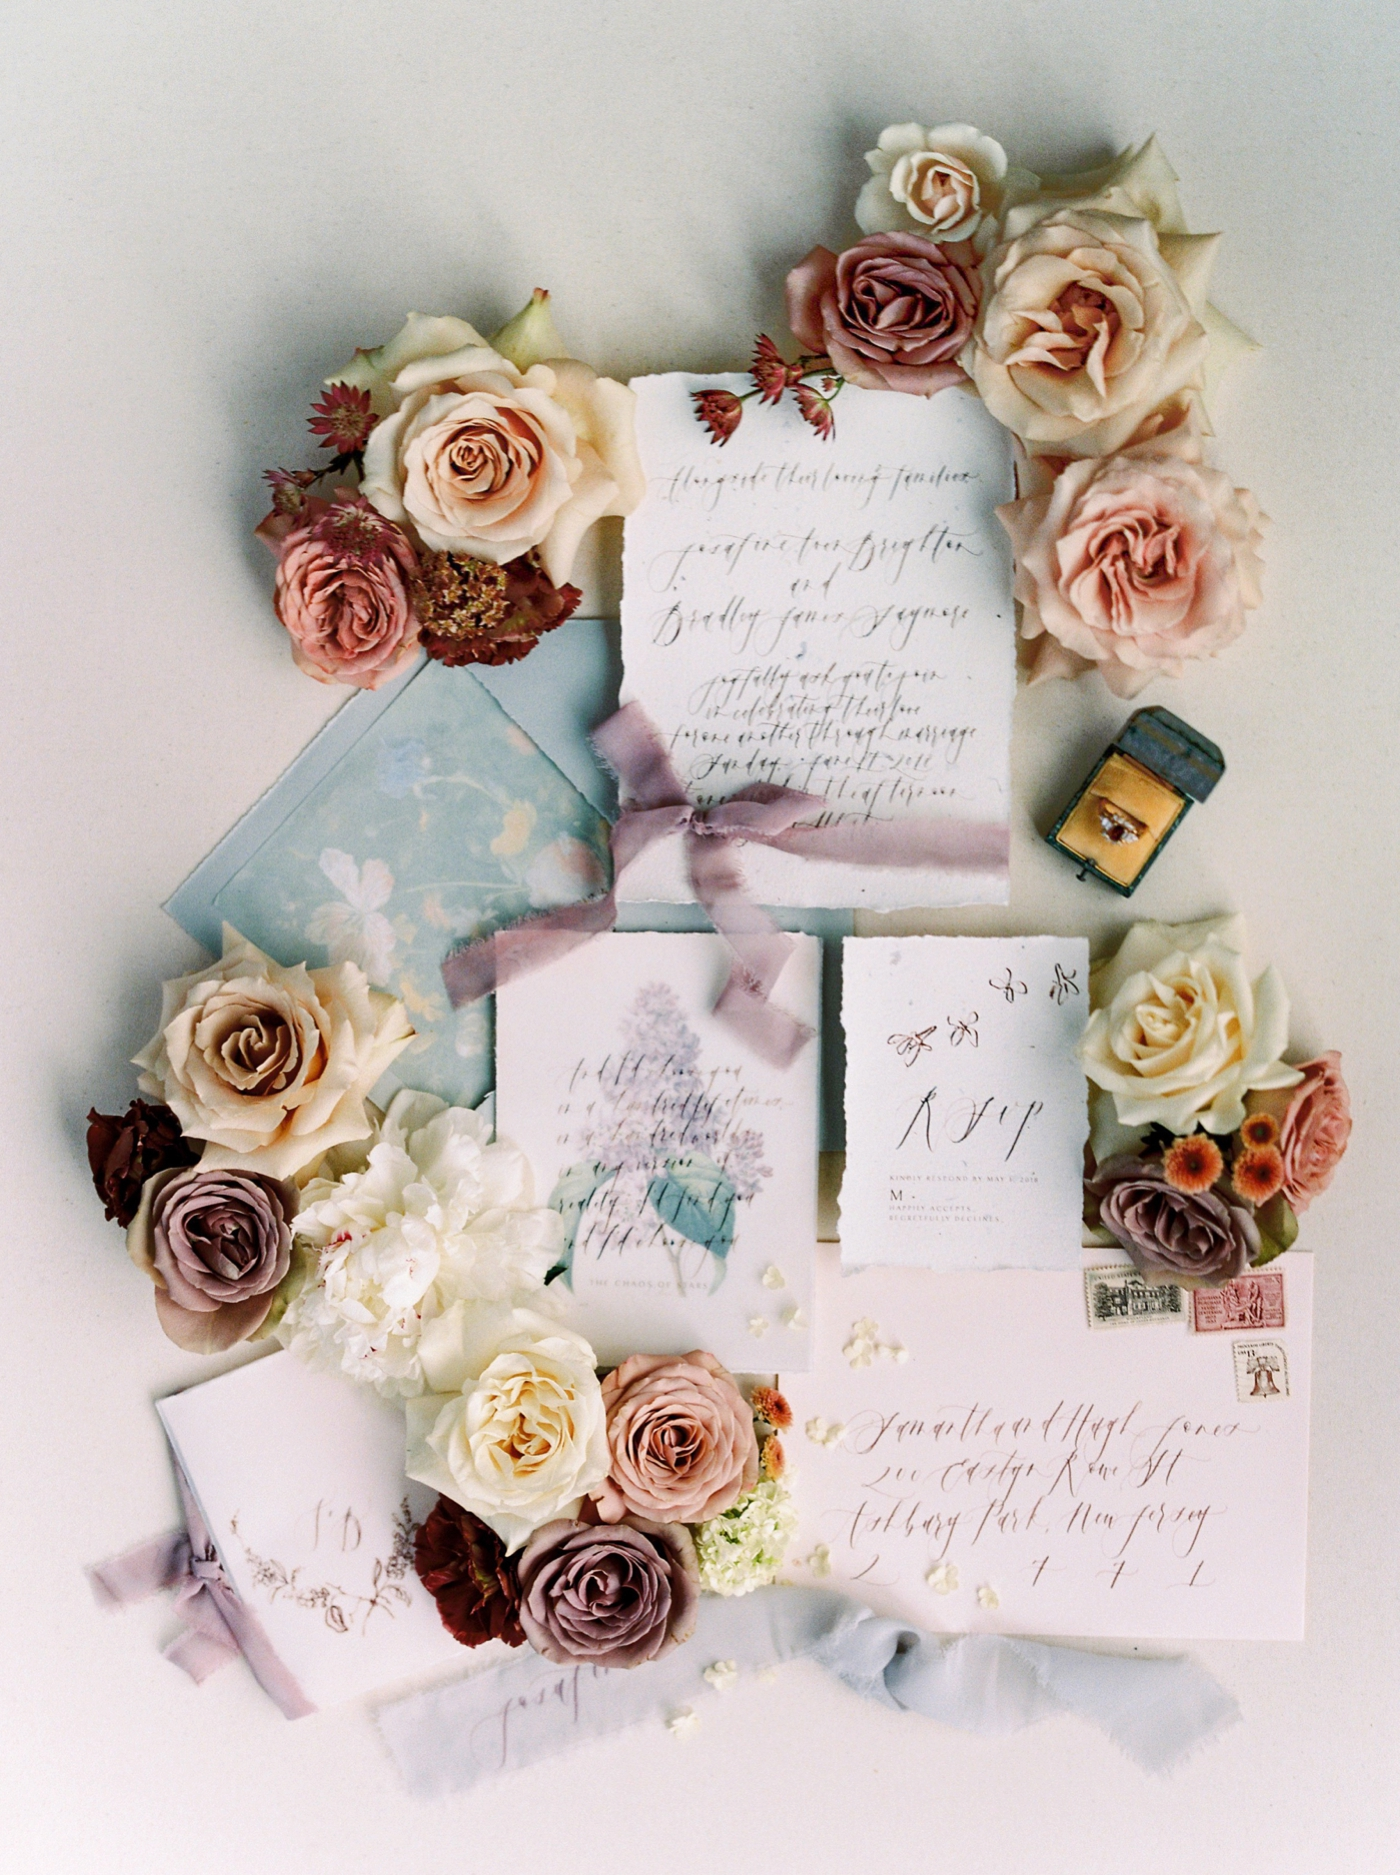 Stacey Foley Design Joy Wed Fine Art Series Photography Workshop | Banff wedding photographers | Rimrock resort wedding | wedding stationery invitations